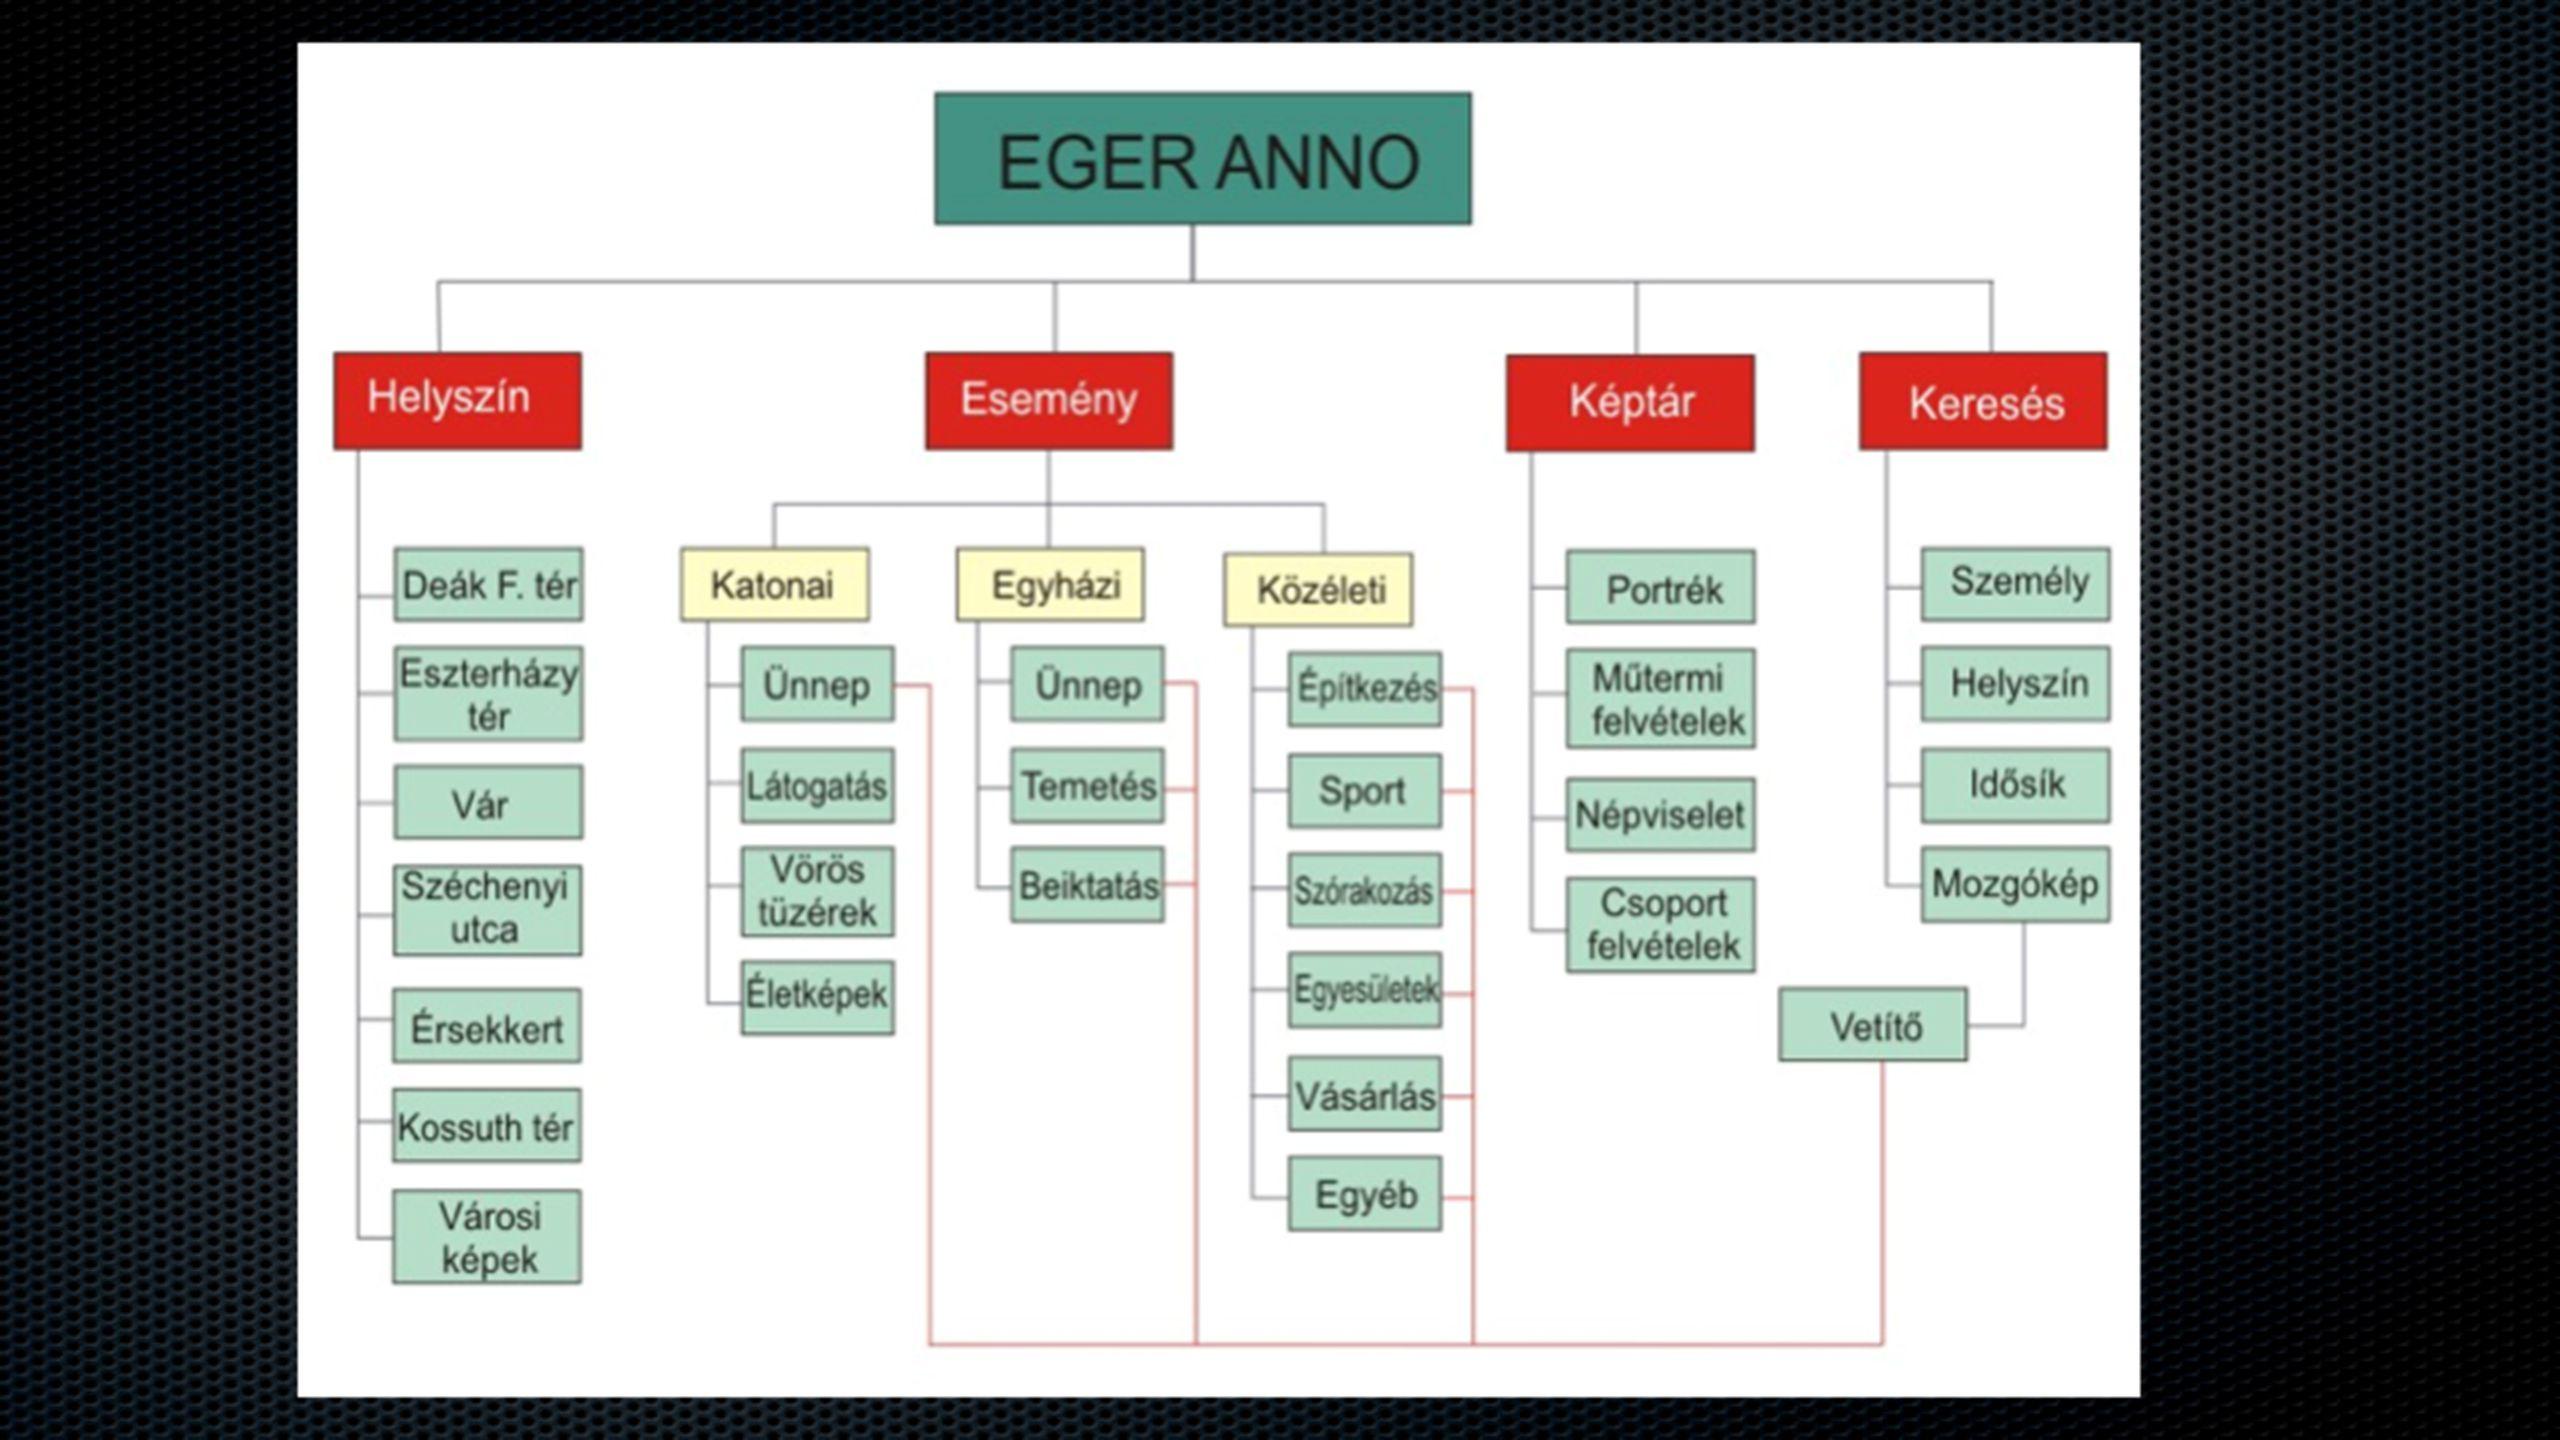 Az Eger Anno multimédia navigációs struktúrája